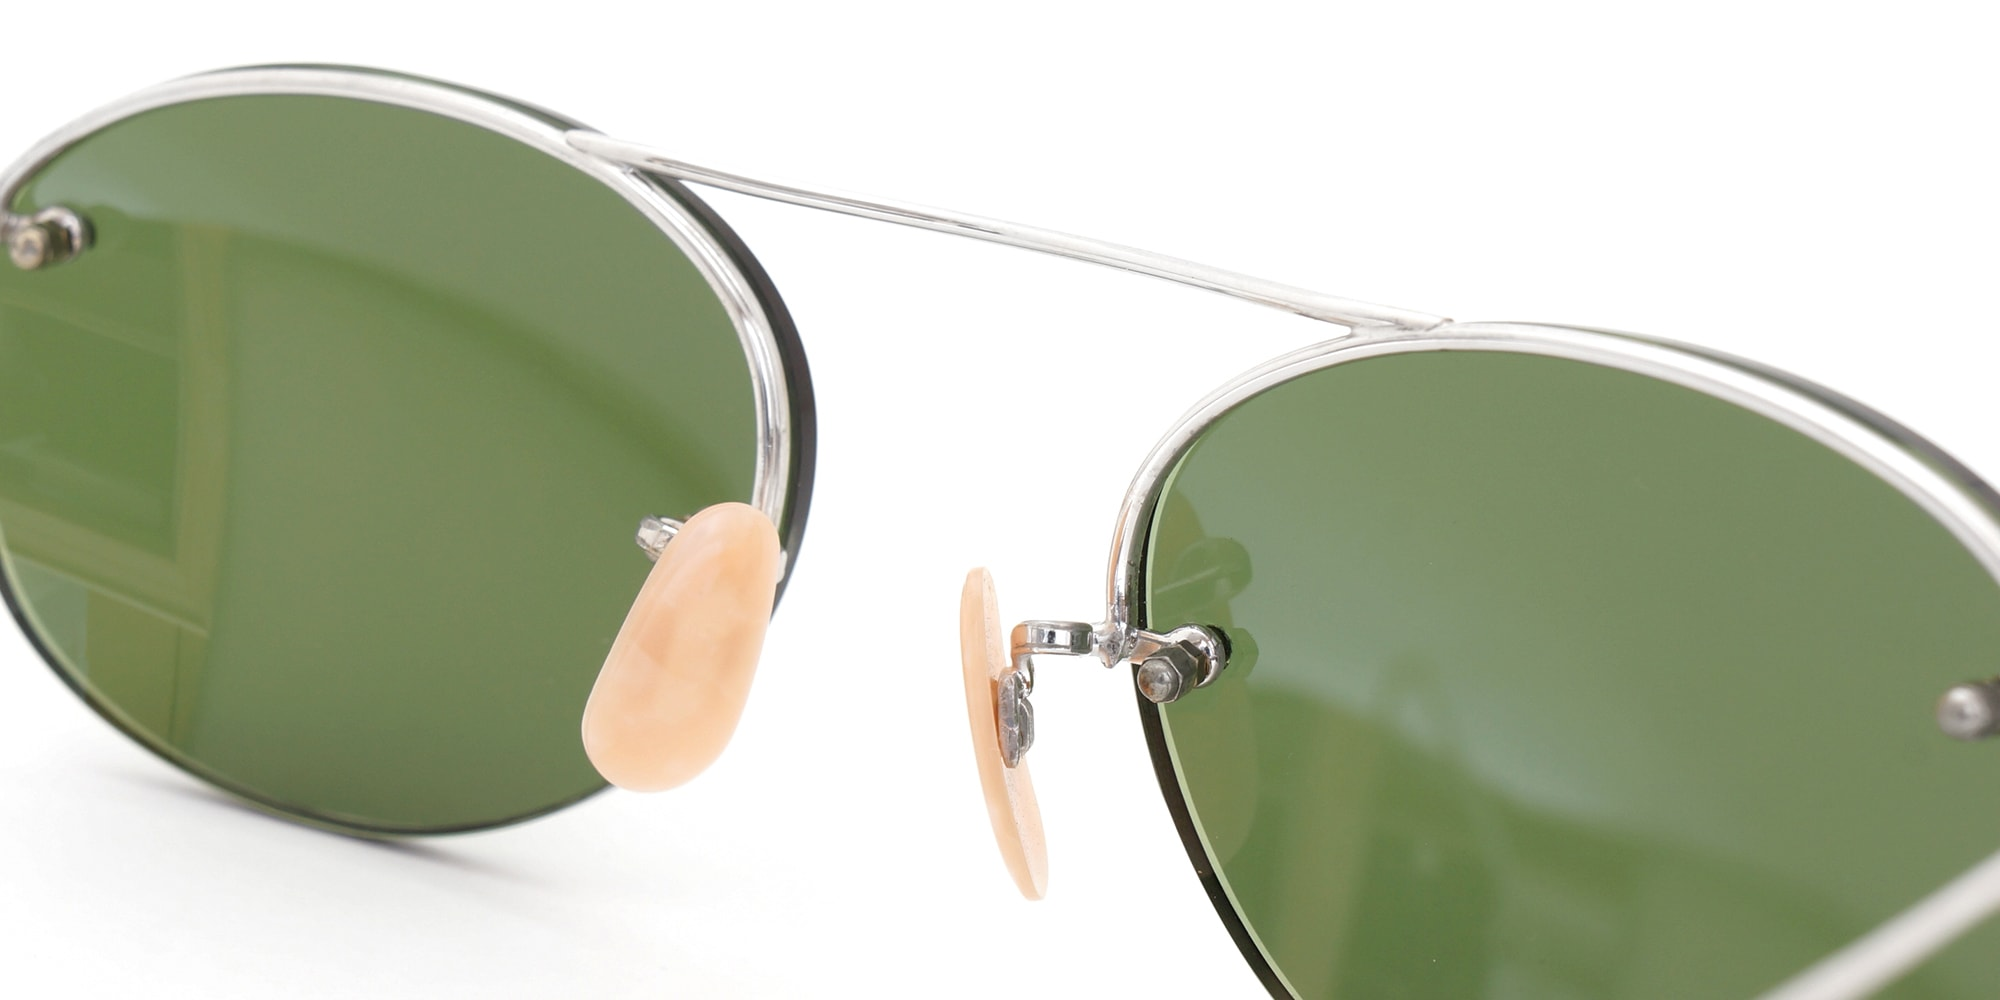 The Spectacle サングラス 1938-1950s SHURON Mid-Century-Modern-Bar 1/10 12KGF 44/20 イメージ8